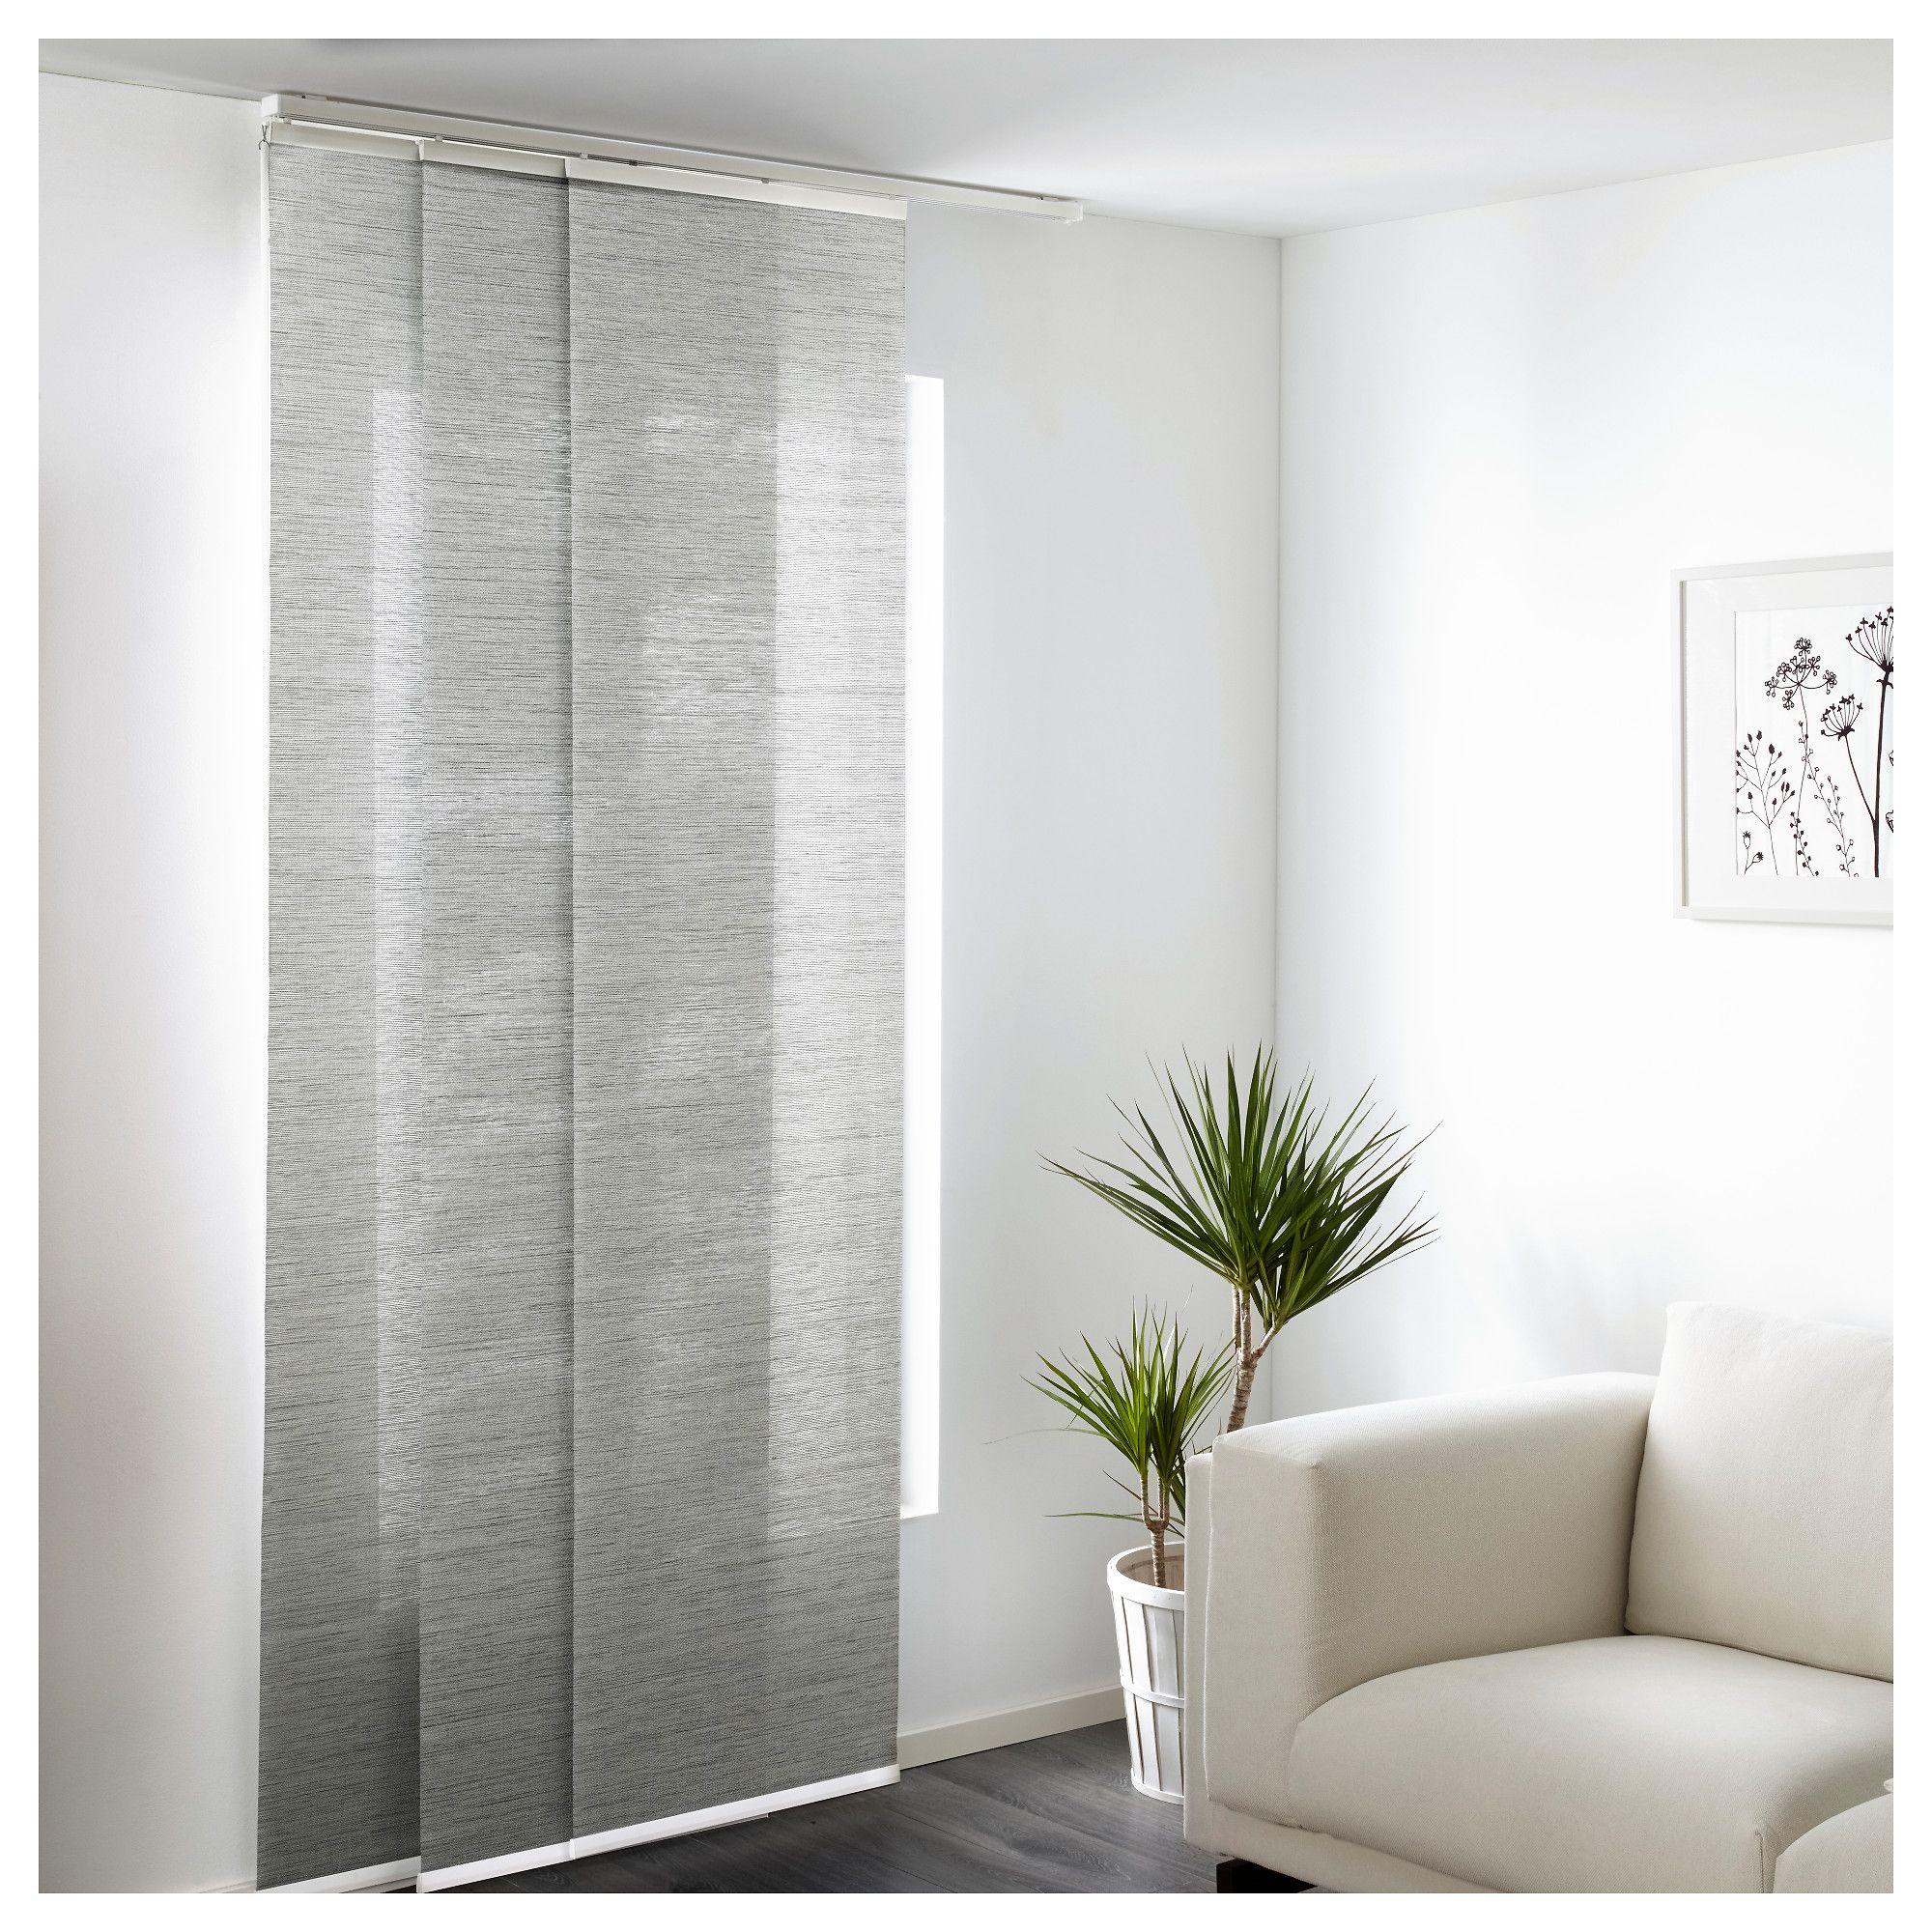 Ikea panel curtains - Anno Sanela Panel Curtain Grey 60x300 Cm